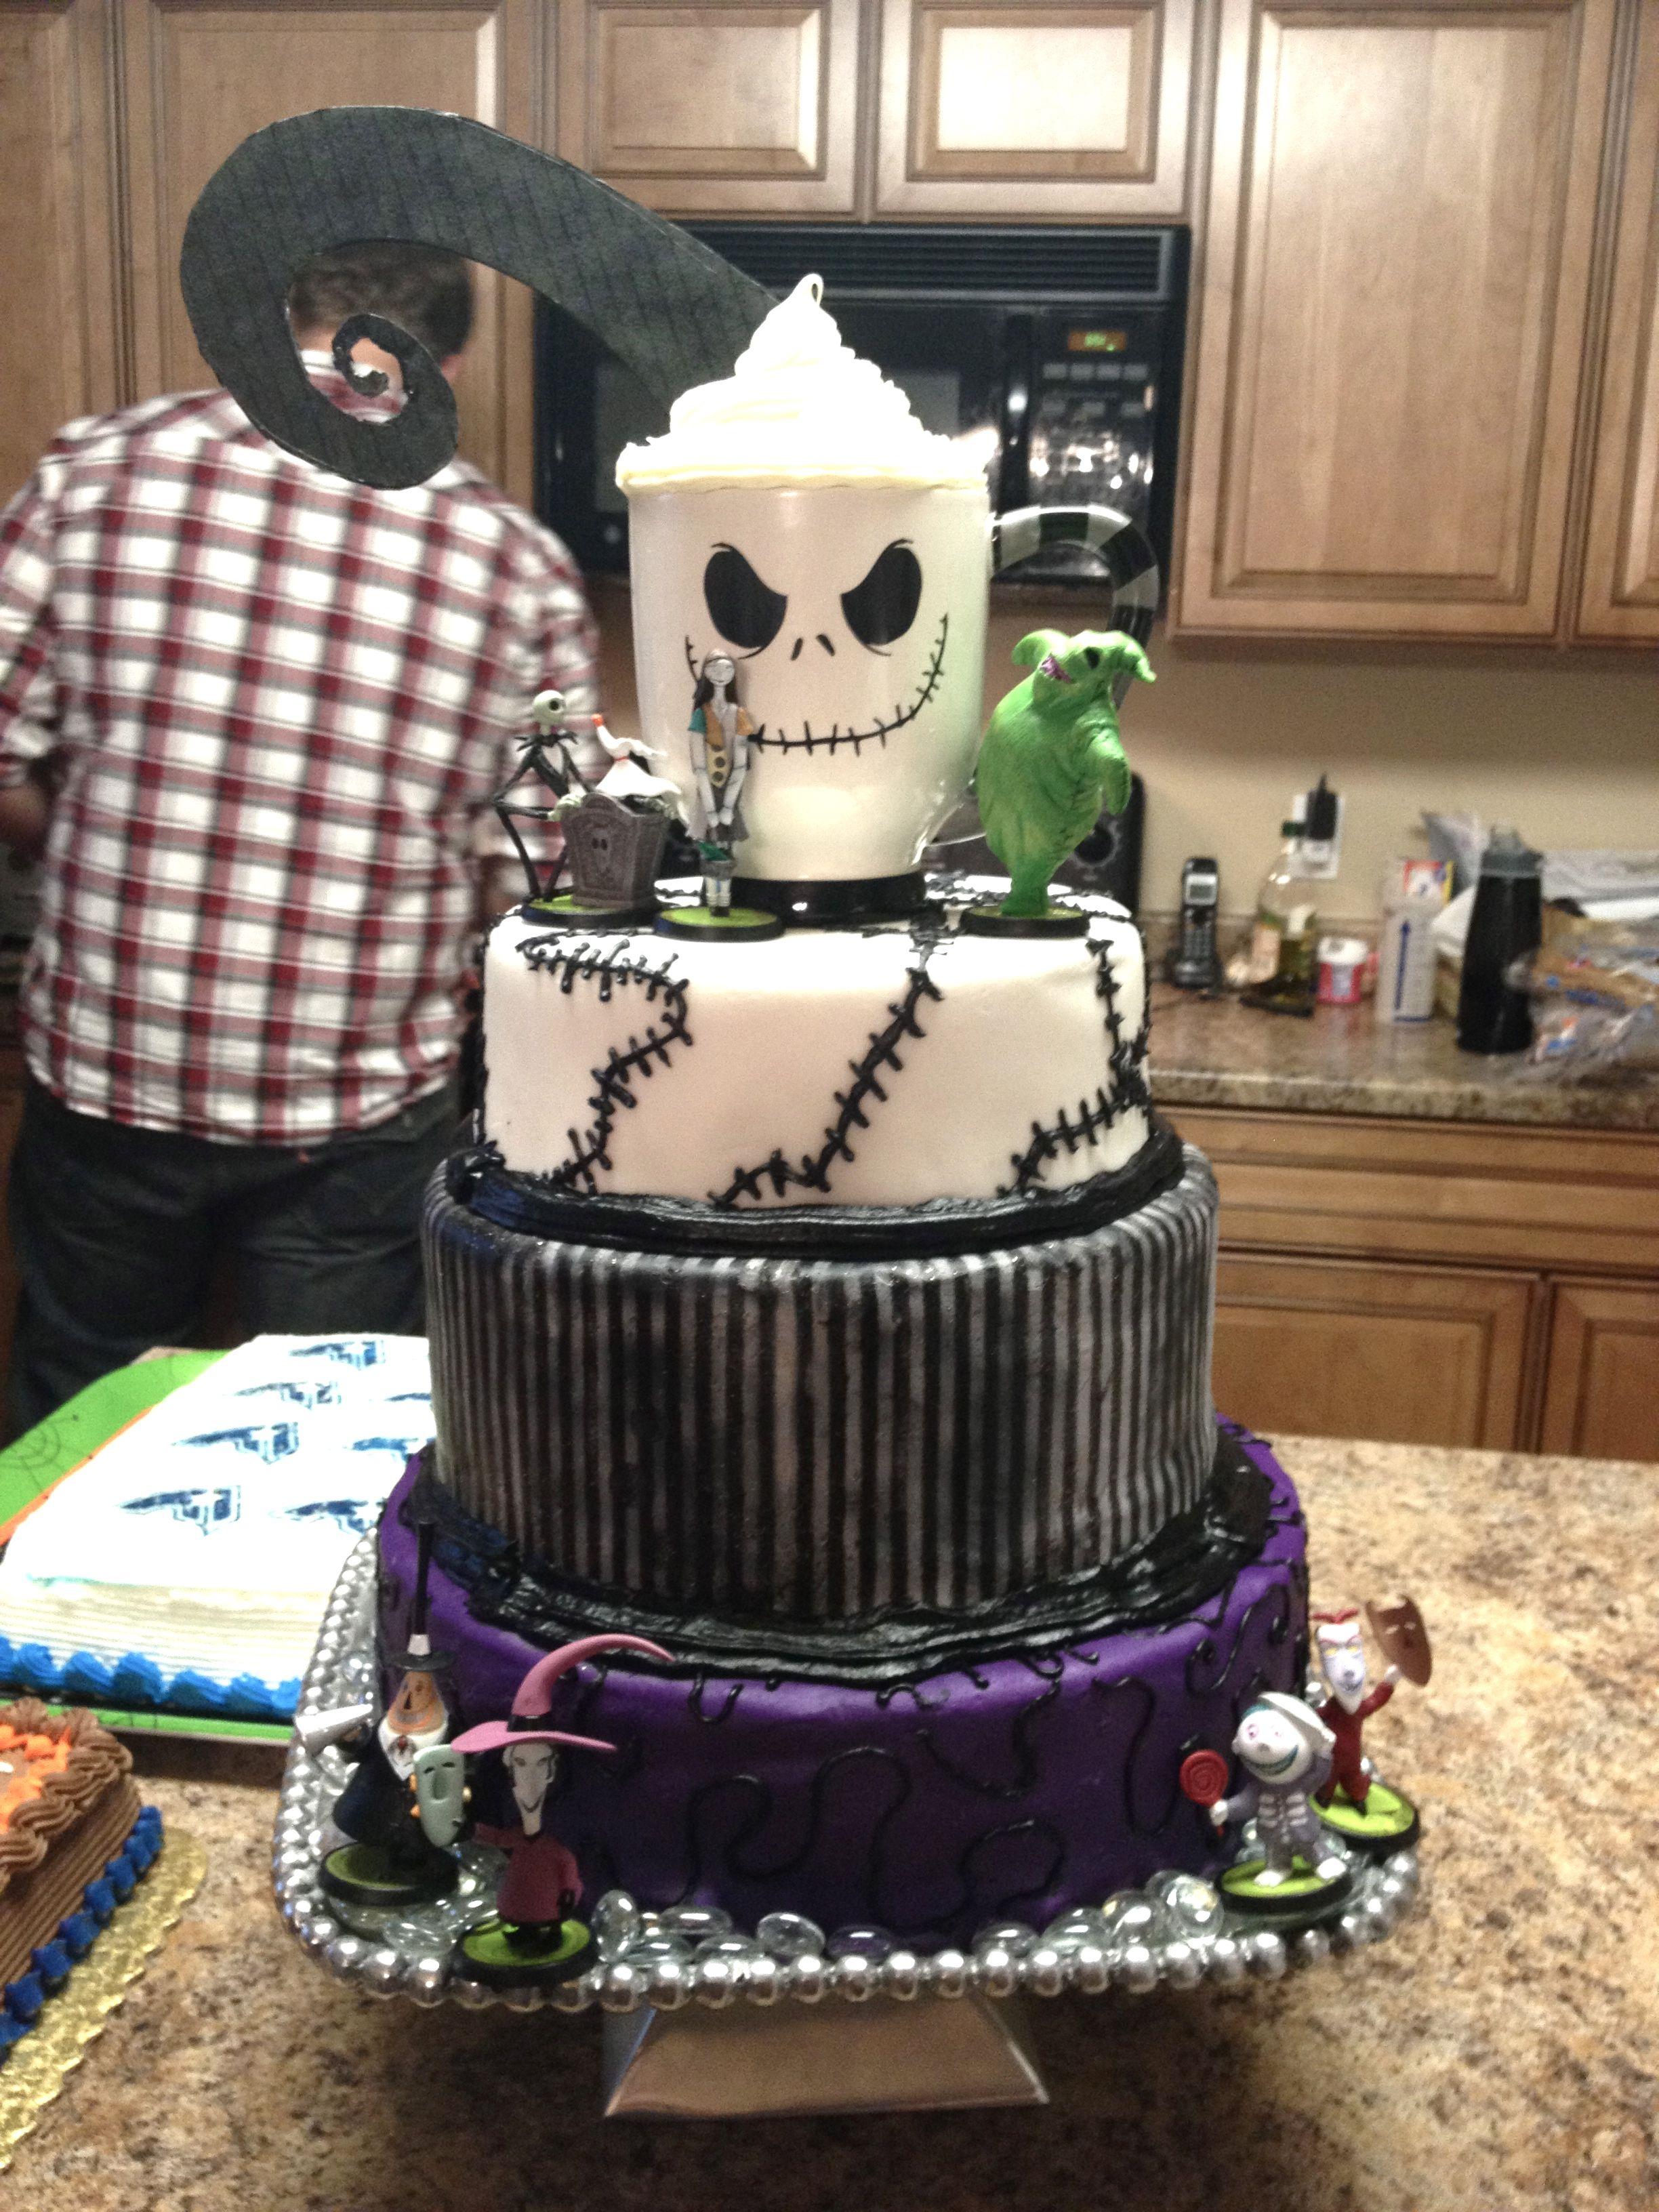 Nightmare Before Christmas Birthday Cake We Made For My Nephews